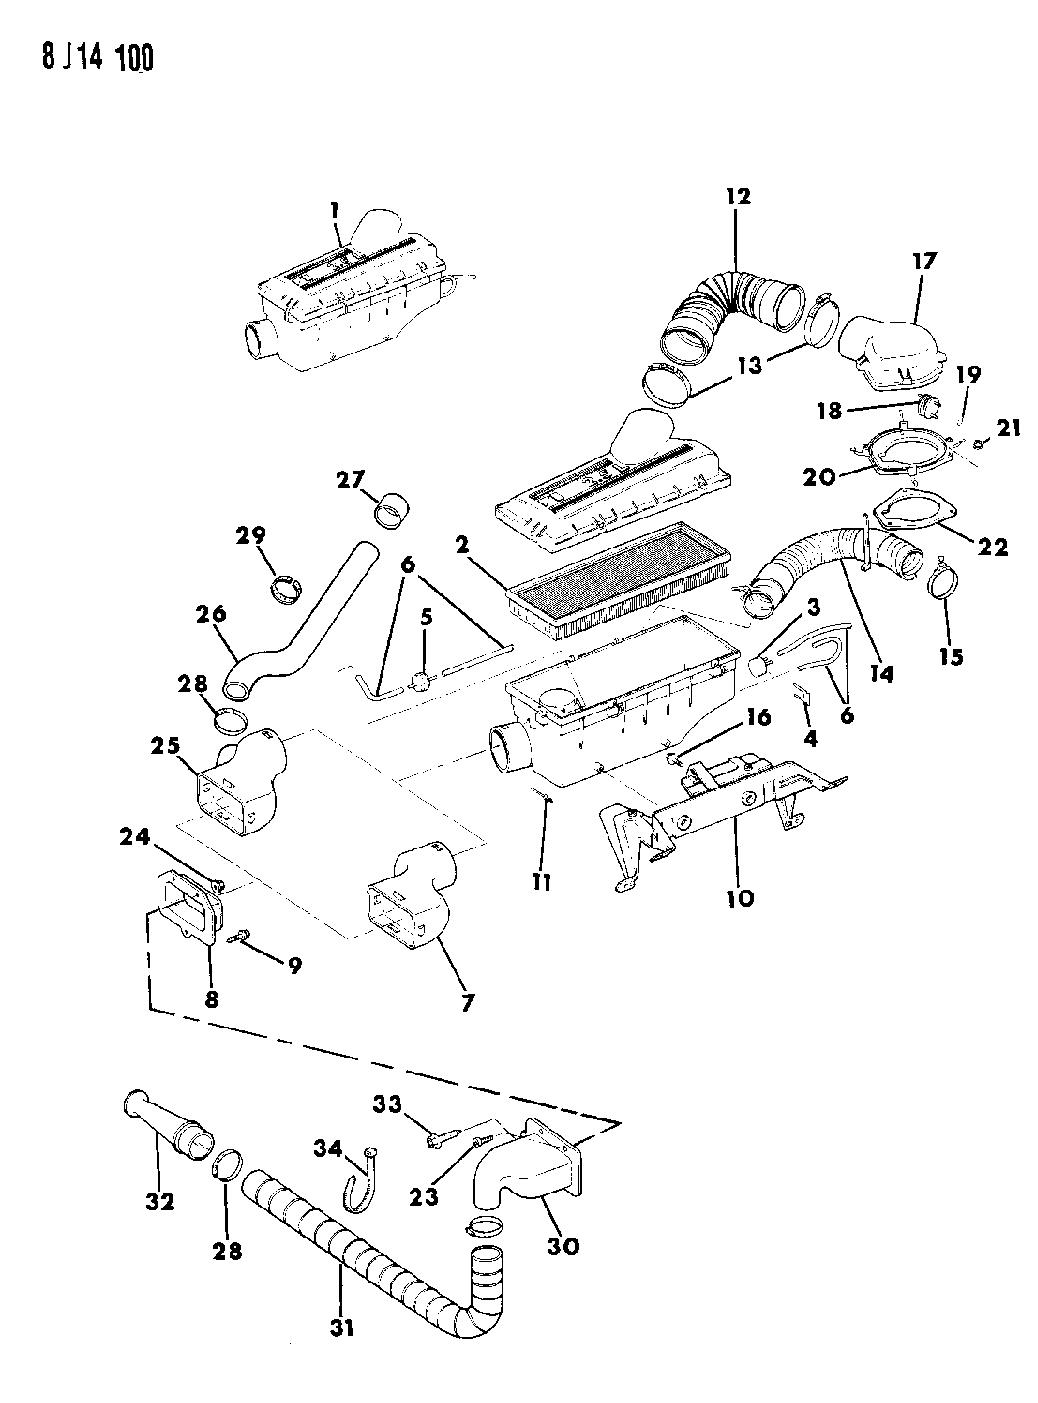 1990 Jeep Wrangler Air Cleaner Mopar Parts Giant Fuel Filter Thumbnail 1